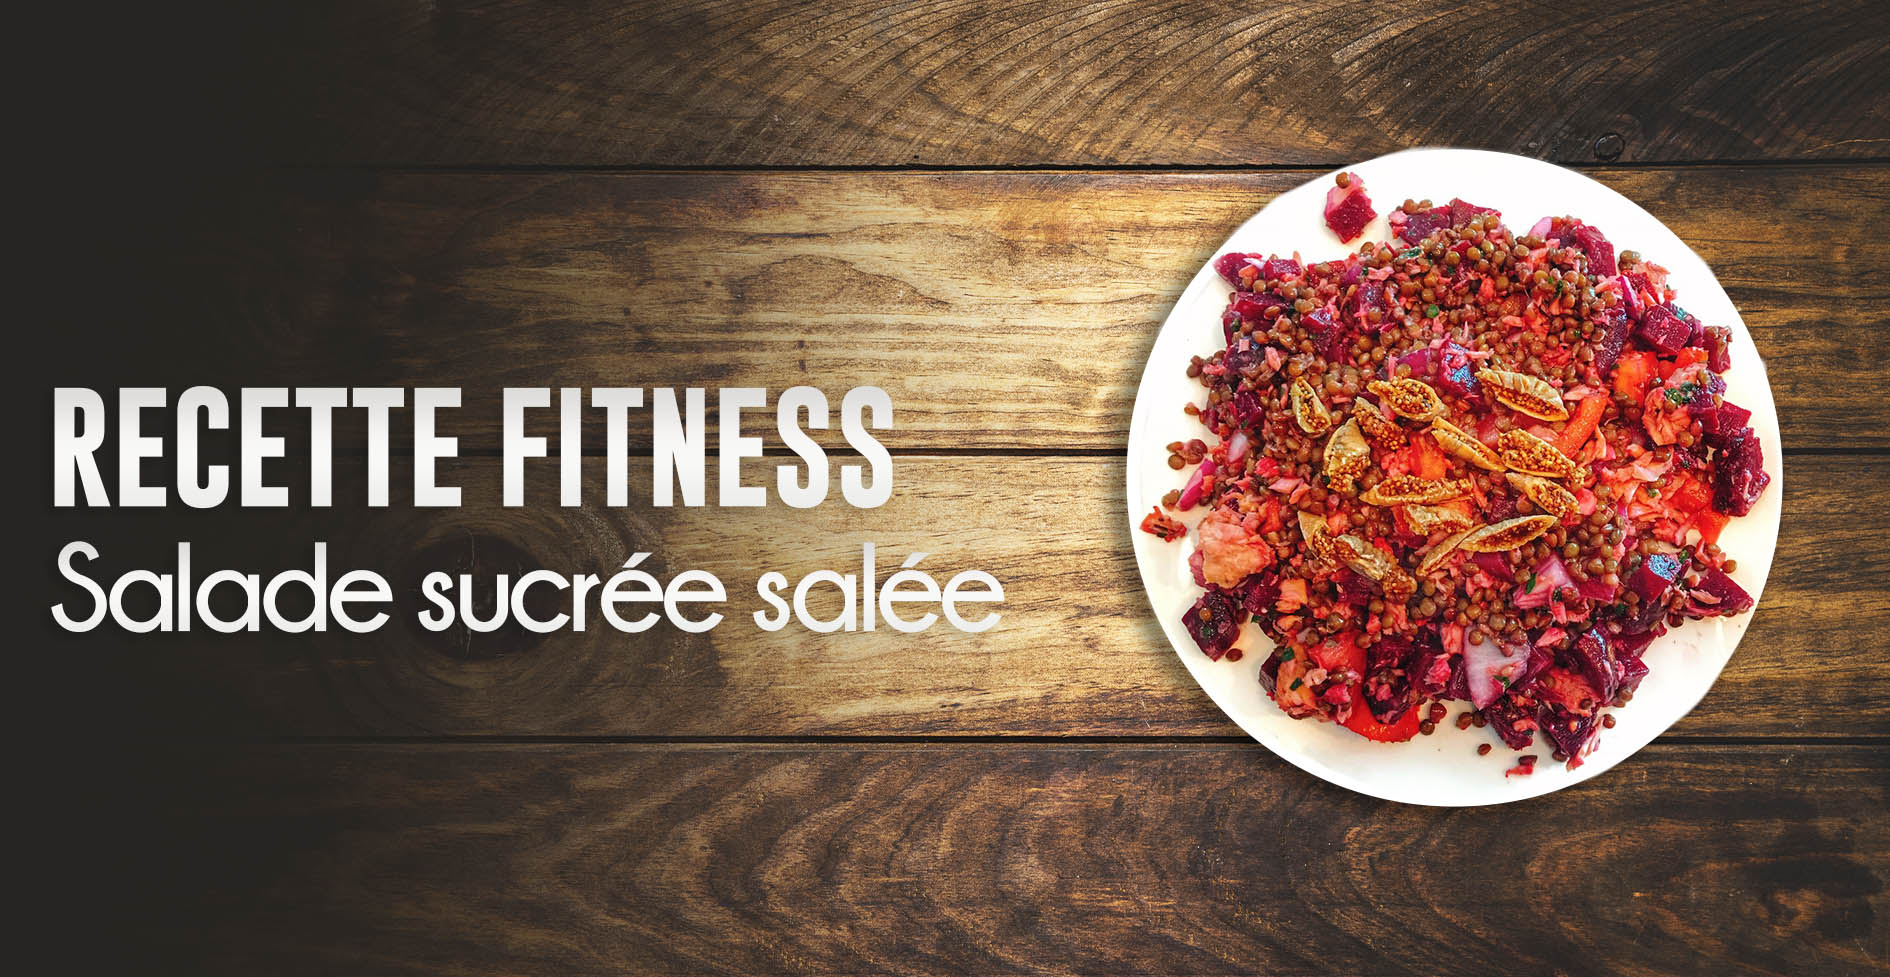 salade fitness sucrée salée